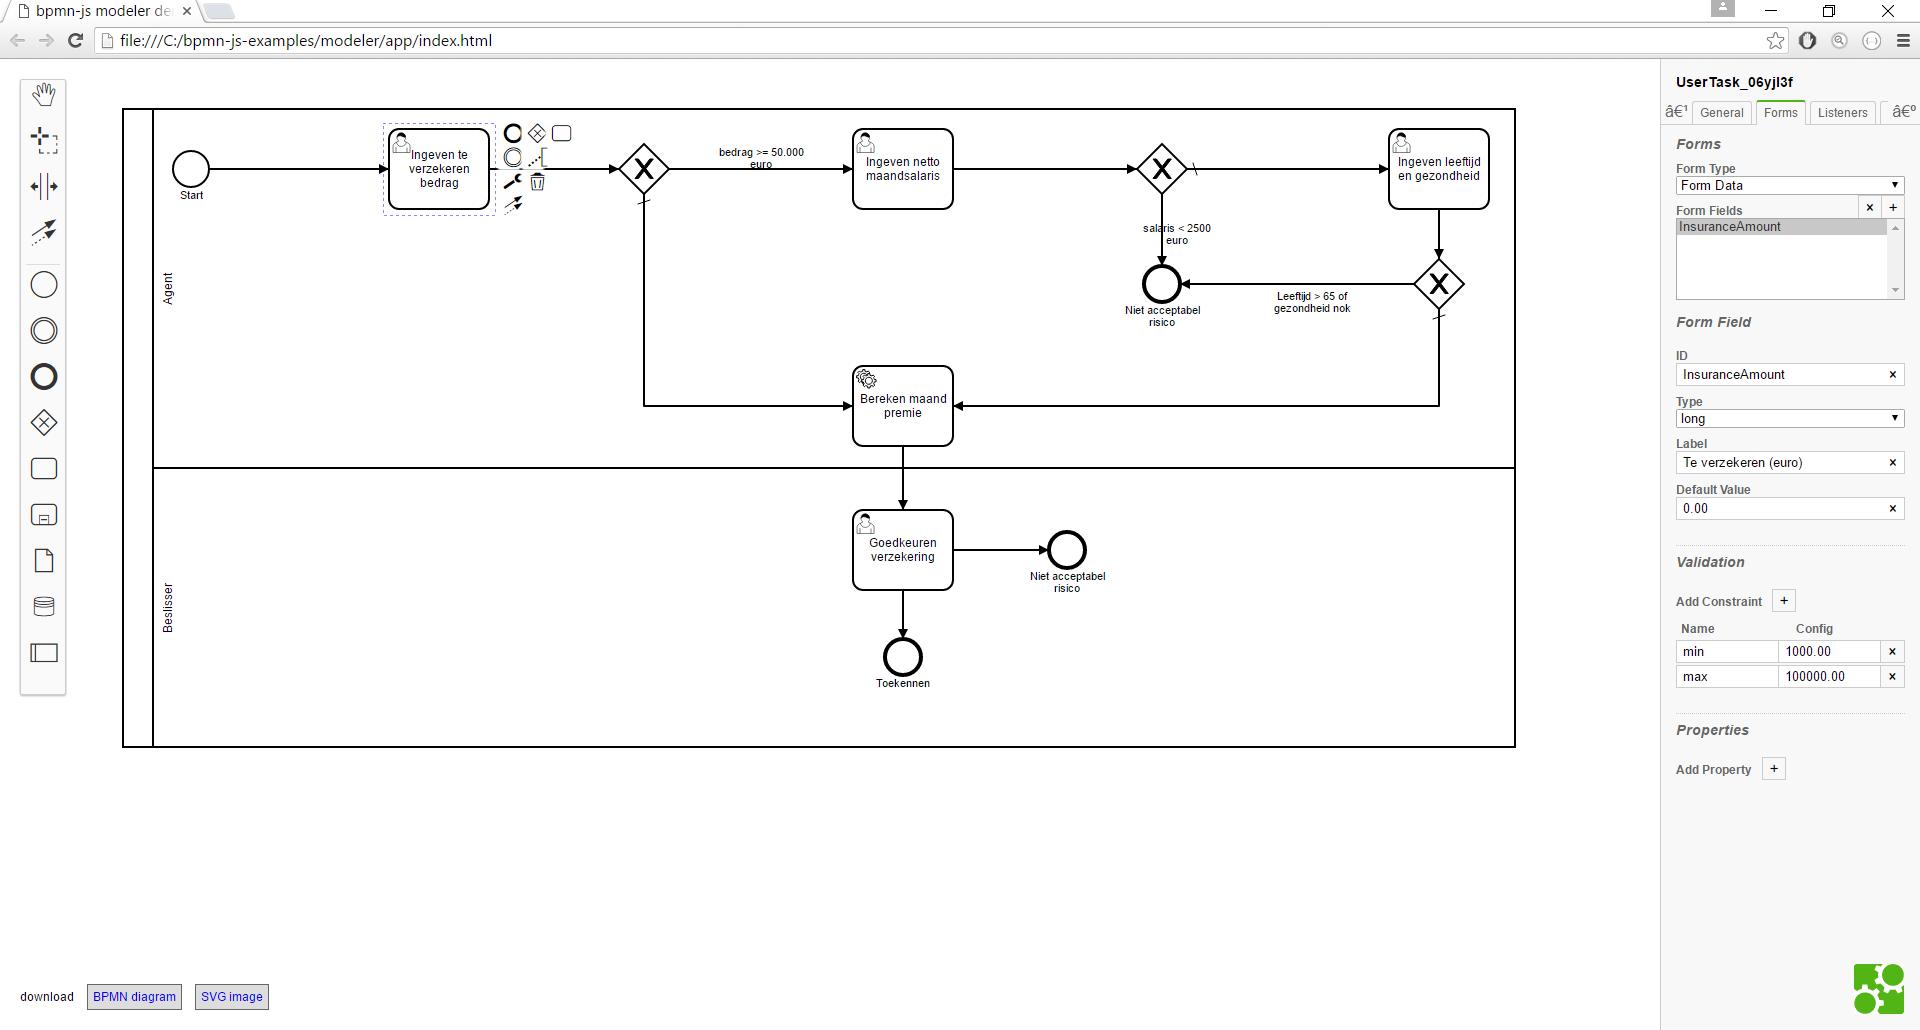 Elixir and bpm business process management elixir chat elixir verzekeringg1920x1030 736 kb ccuart Images